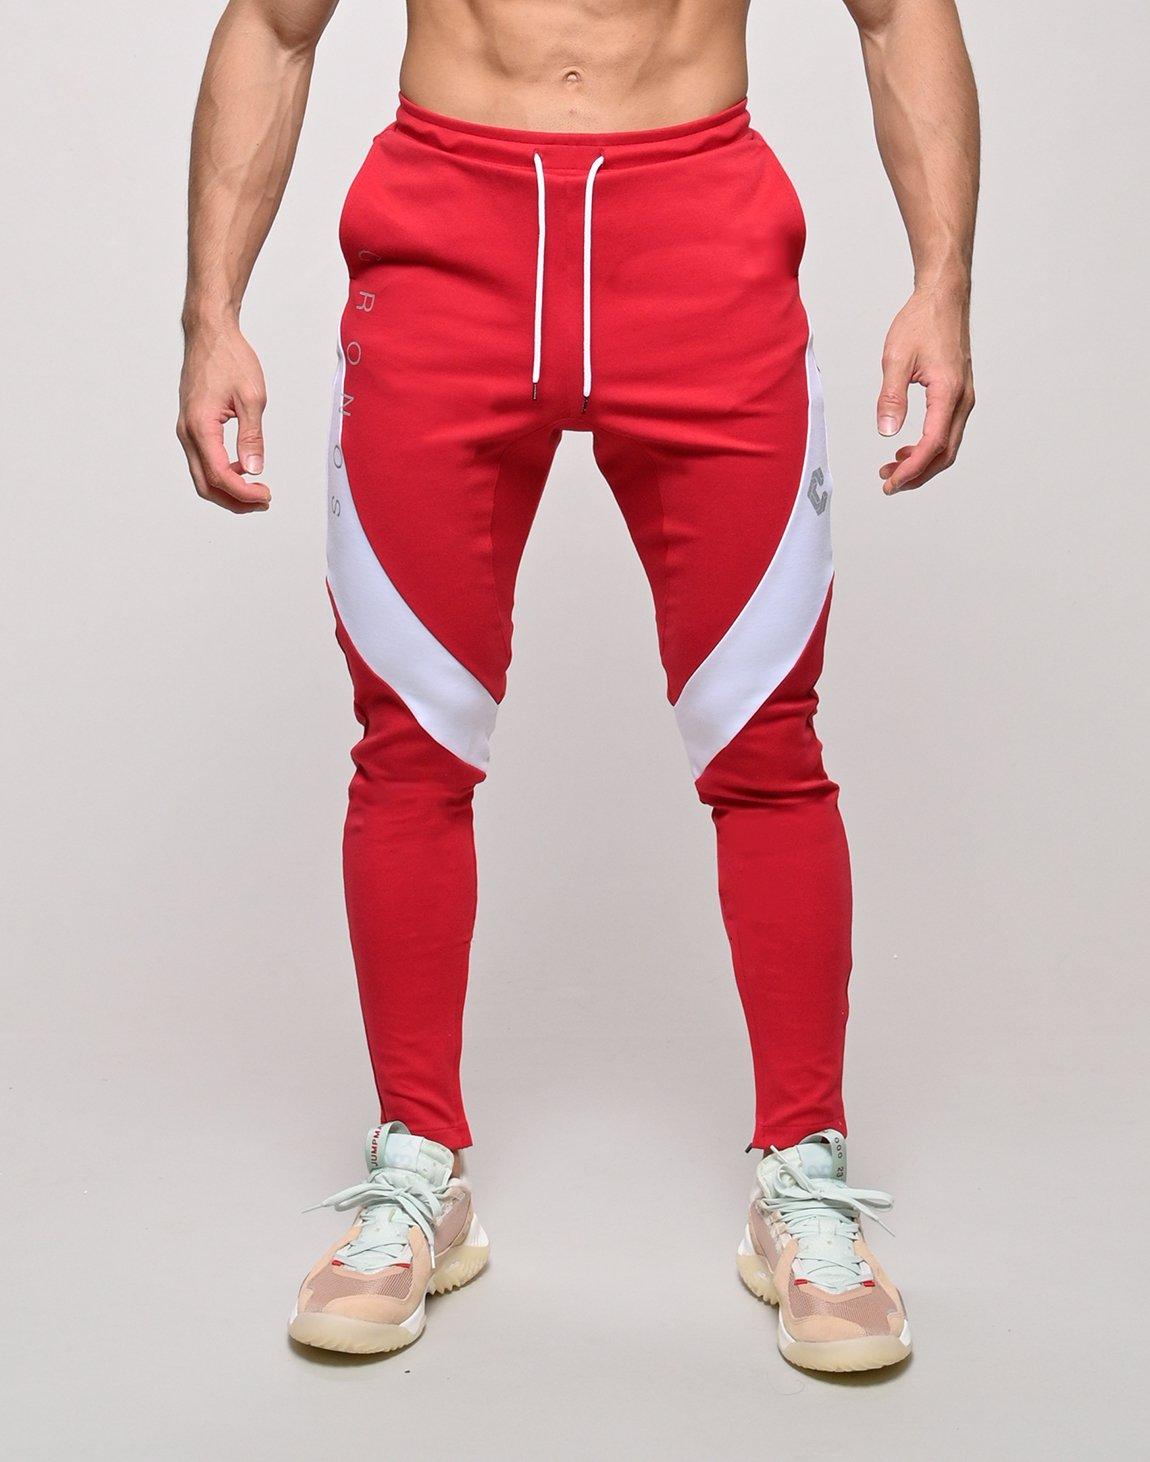 CRONOS QUADRICEPS LINE PANTS【RED】